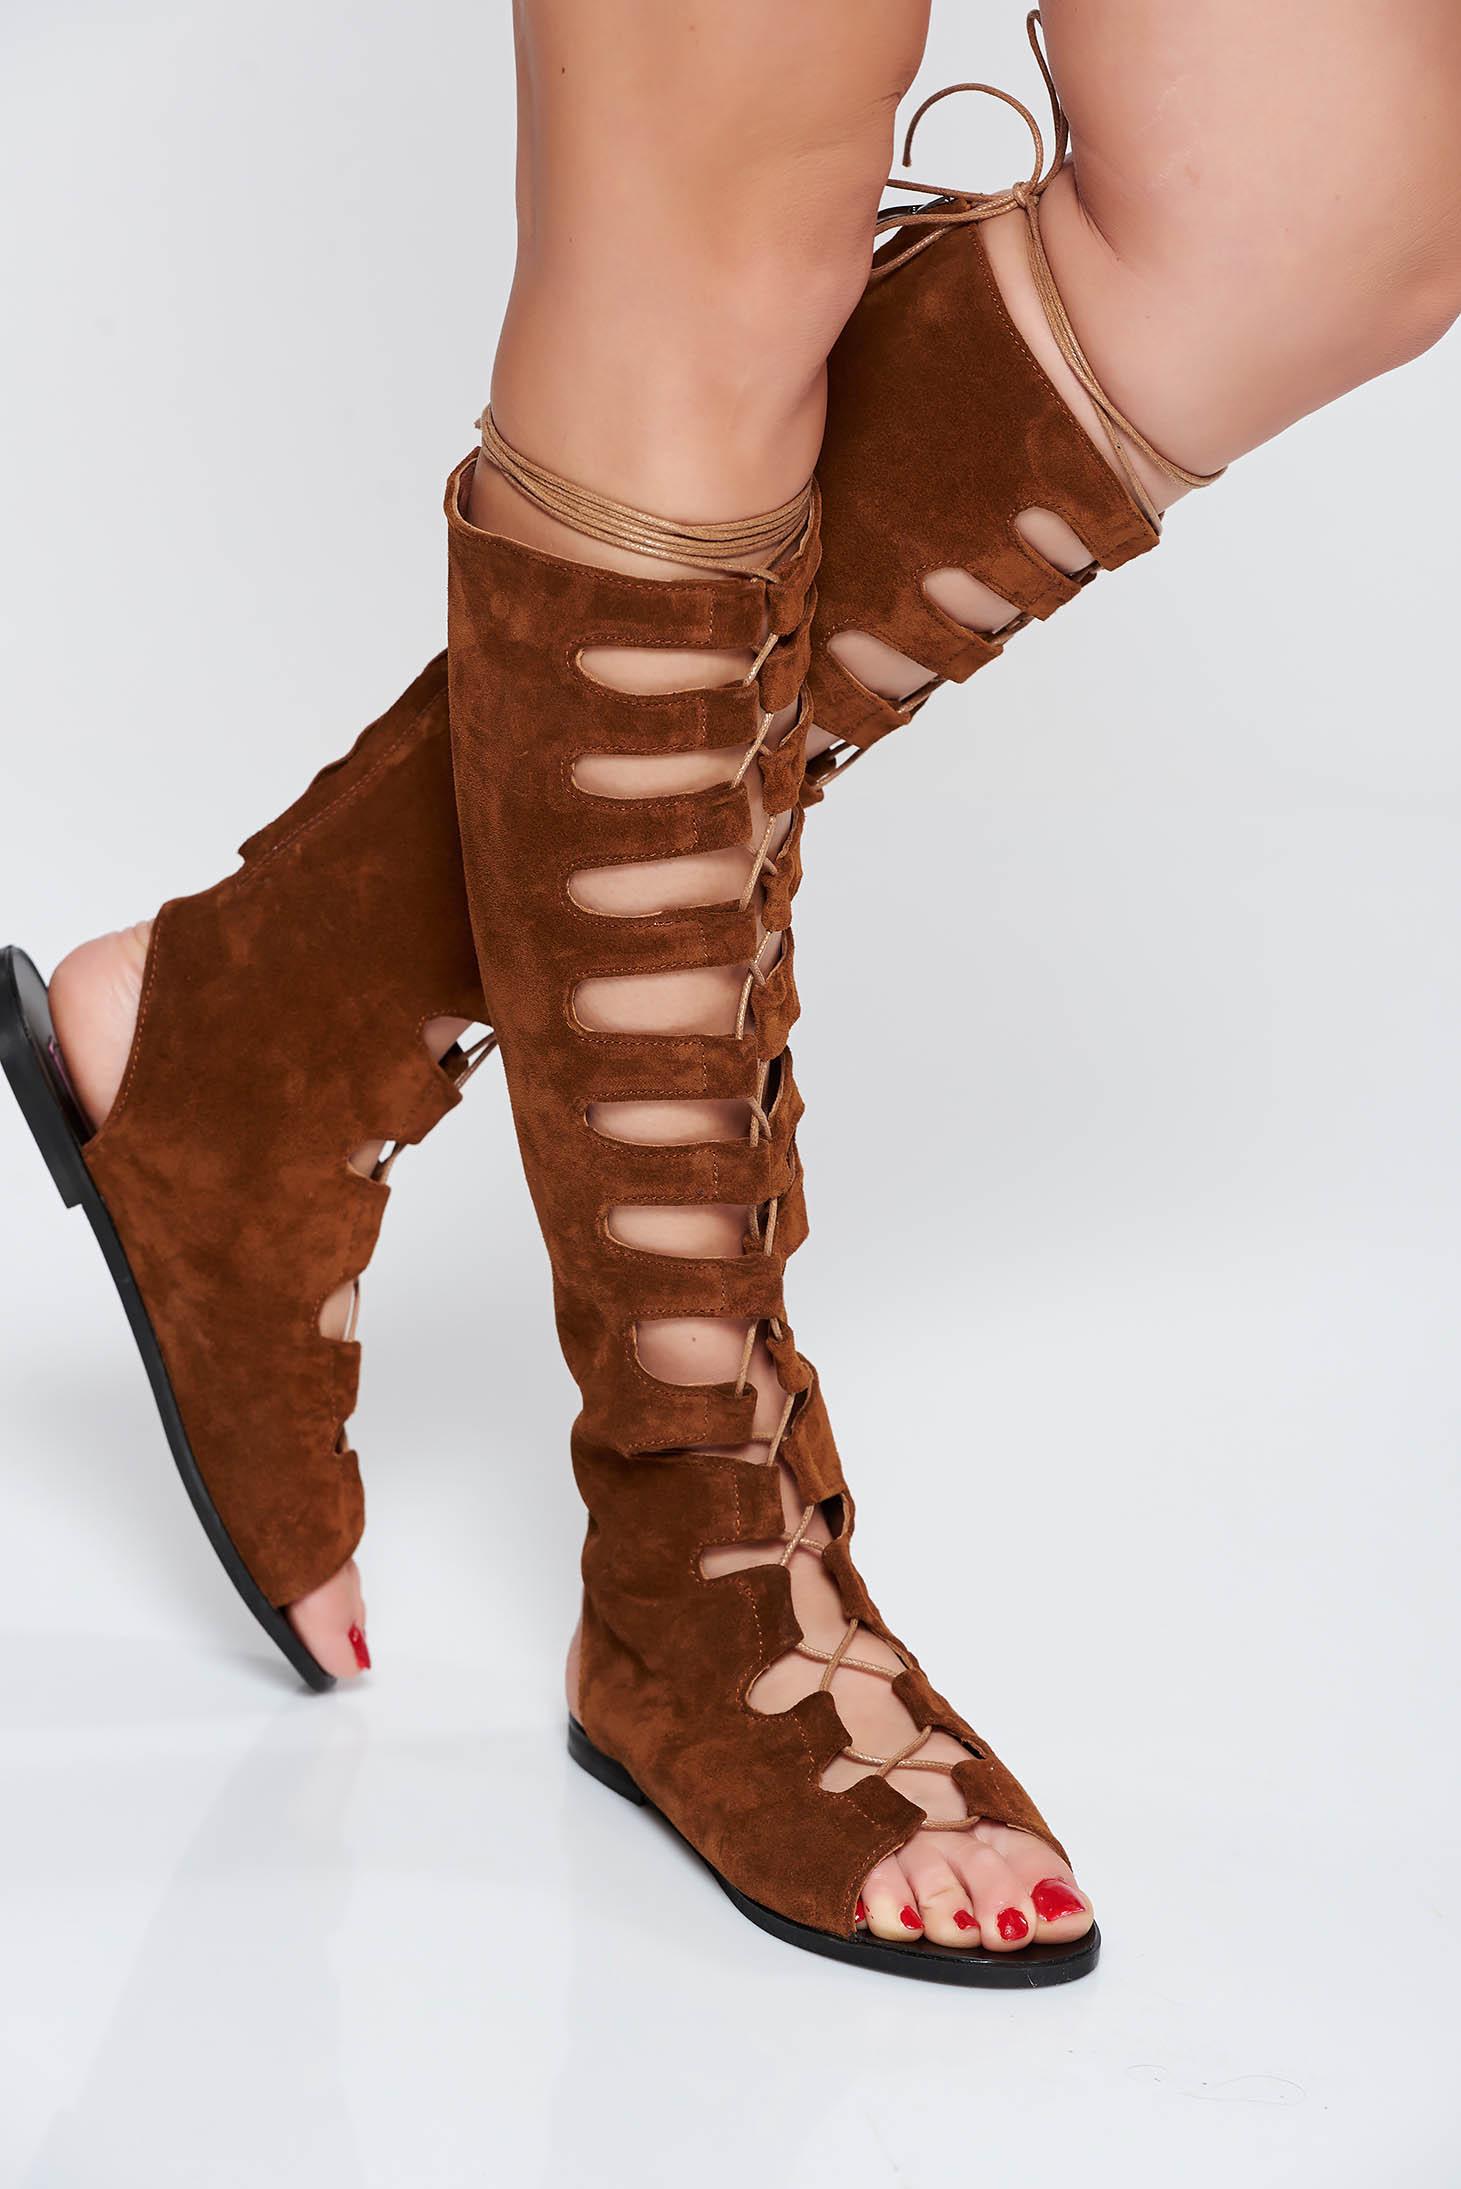 Sandale dama StarShinerS maro casual din piele naturala cu talpa joasa accesorizate cu snur